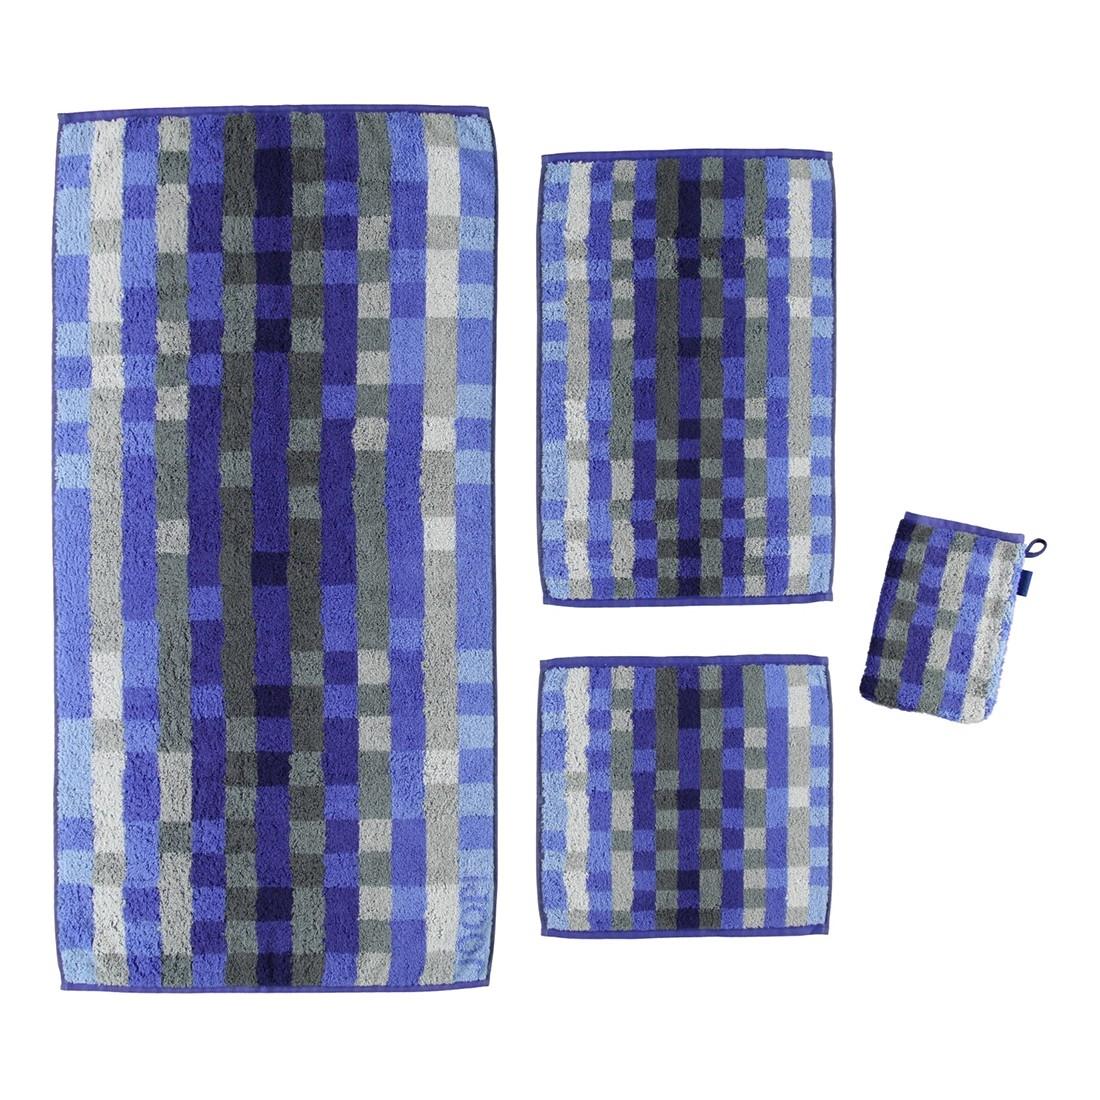 handtuch colour code pixel 100 baumwolle stahlblau 11. Black Bedroom Furniture Sets. Home Design Ideas